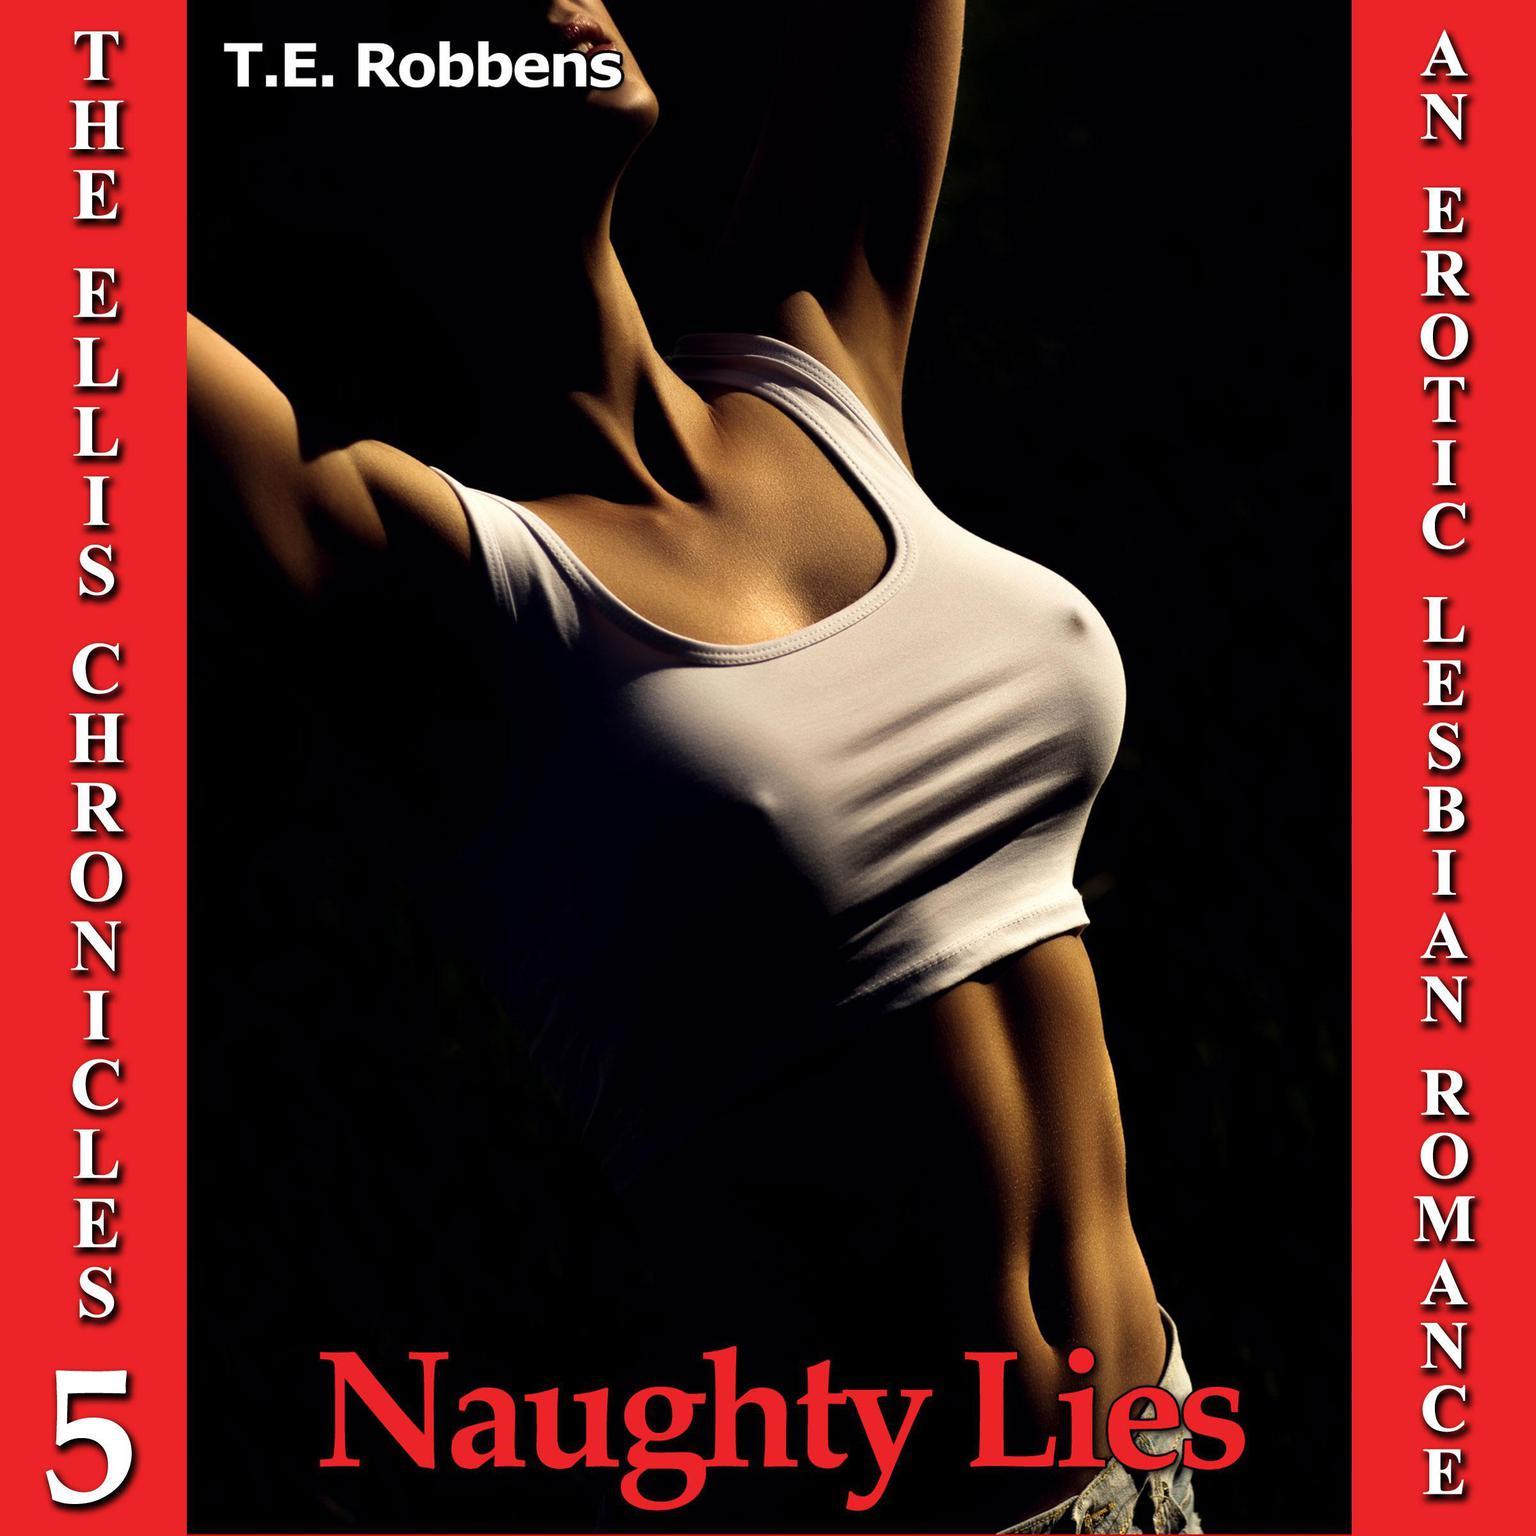 Printable Naughty Lies: An Erotic Lesbian Romance (The Ellis Chronicles - book 5) Audiobook Cover Art